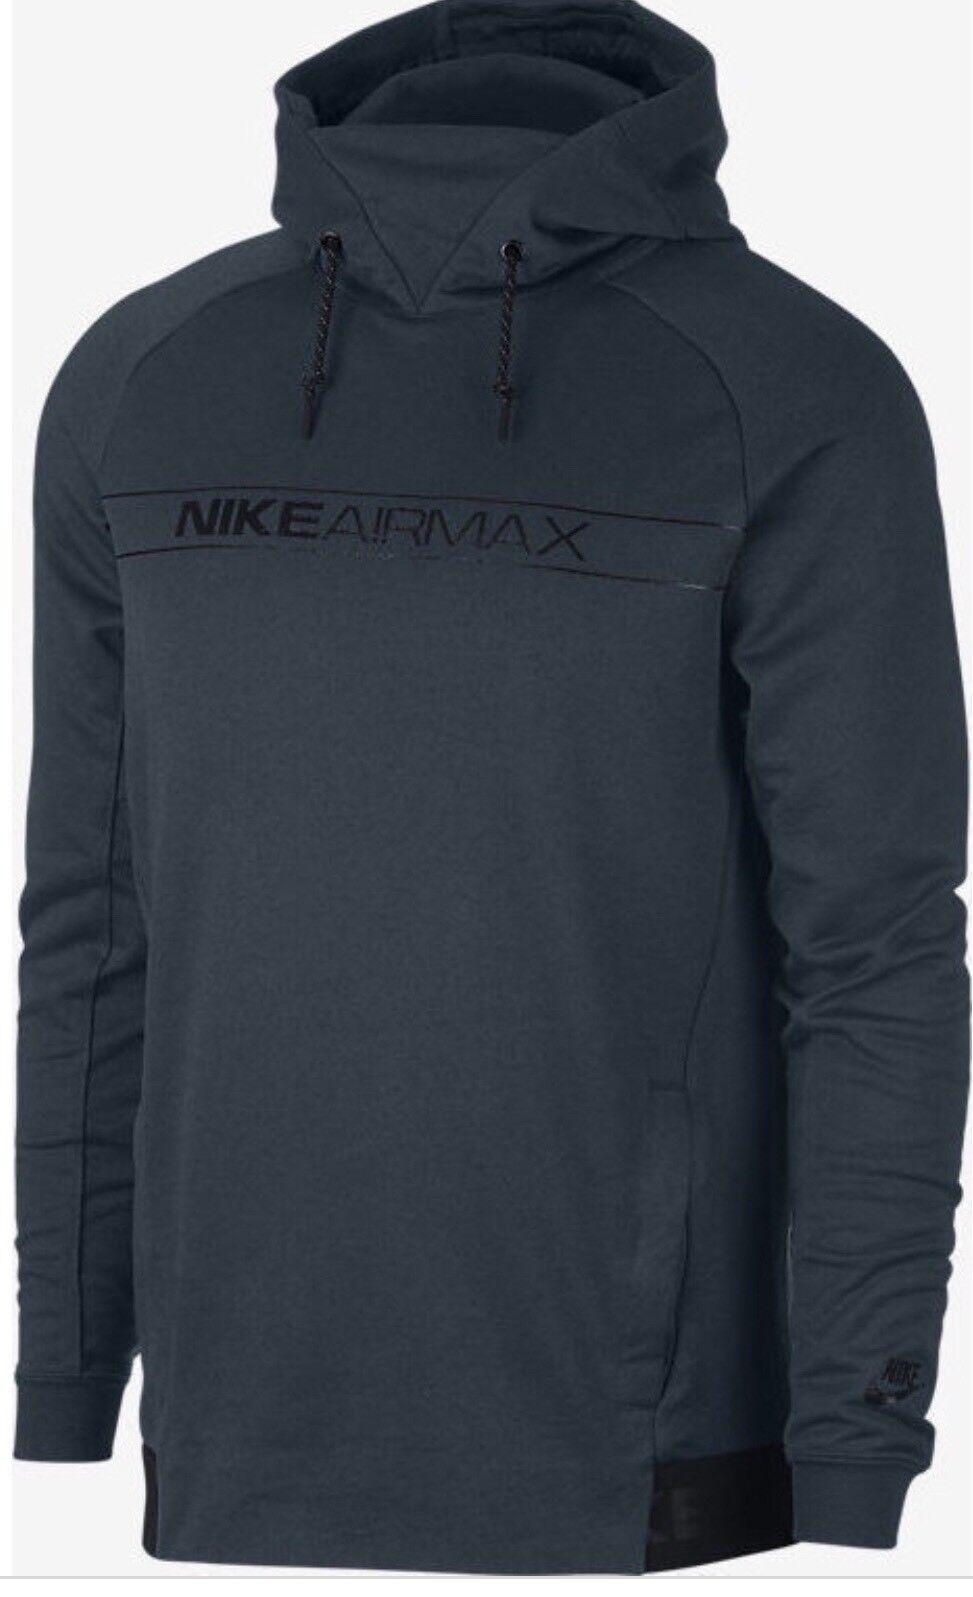 Nike 863738 454 Men's Air Max Sportswear Pullover Hoodie Blue Black Size Large